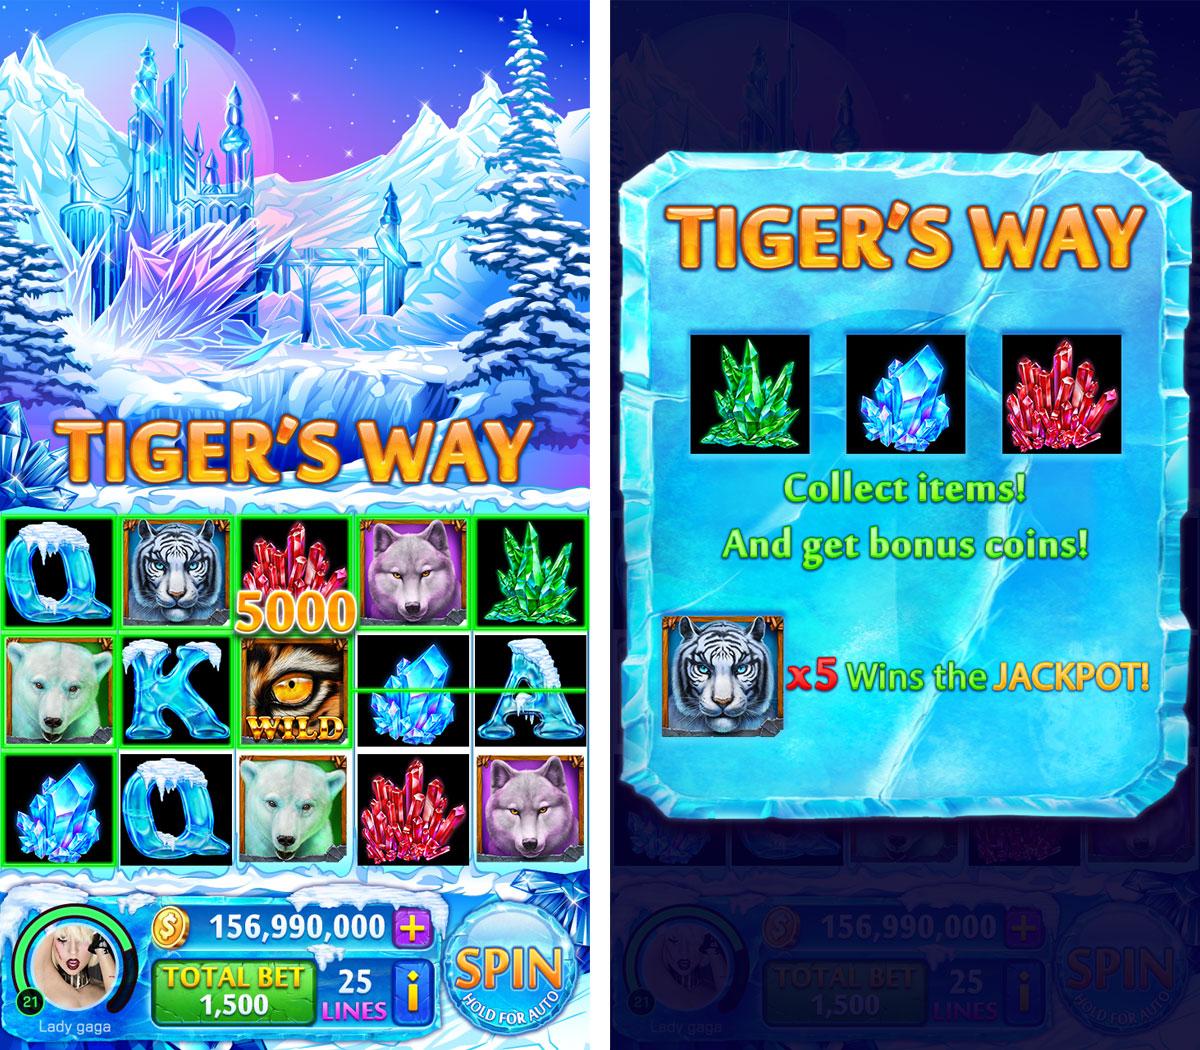 tigers_way_blog_info